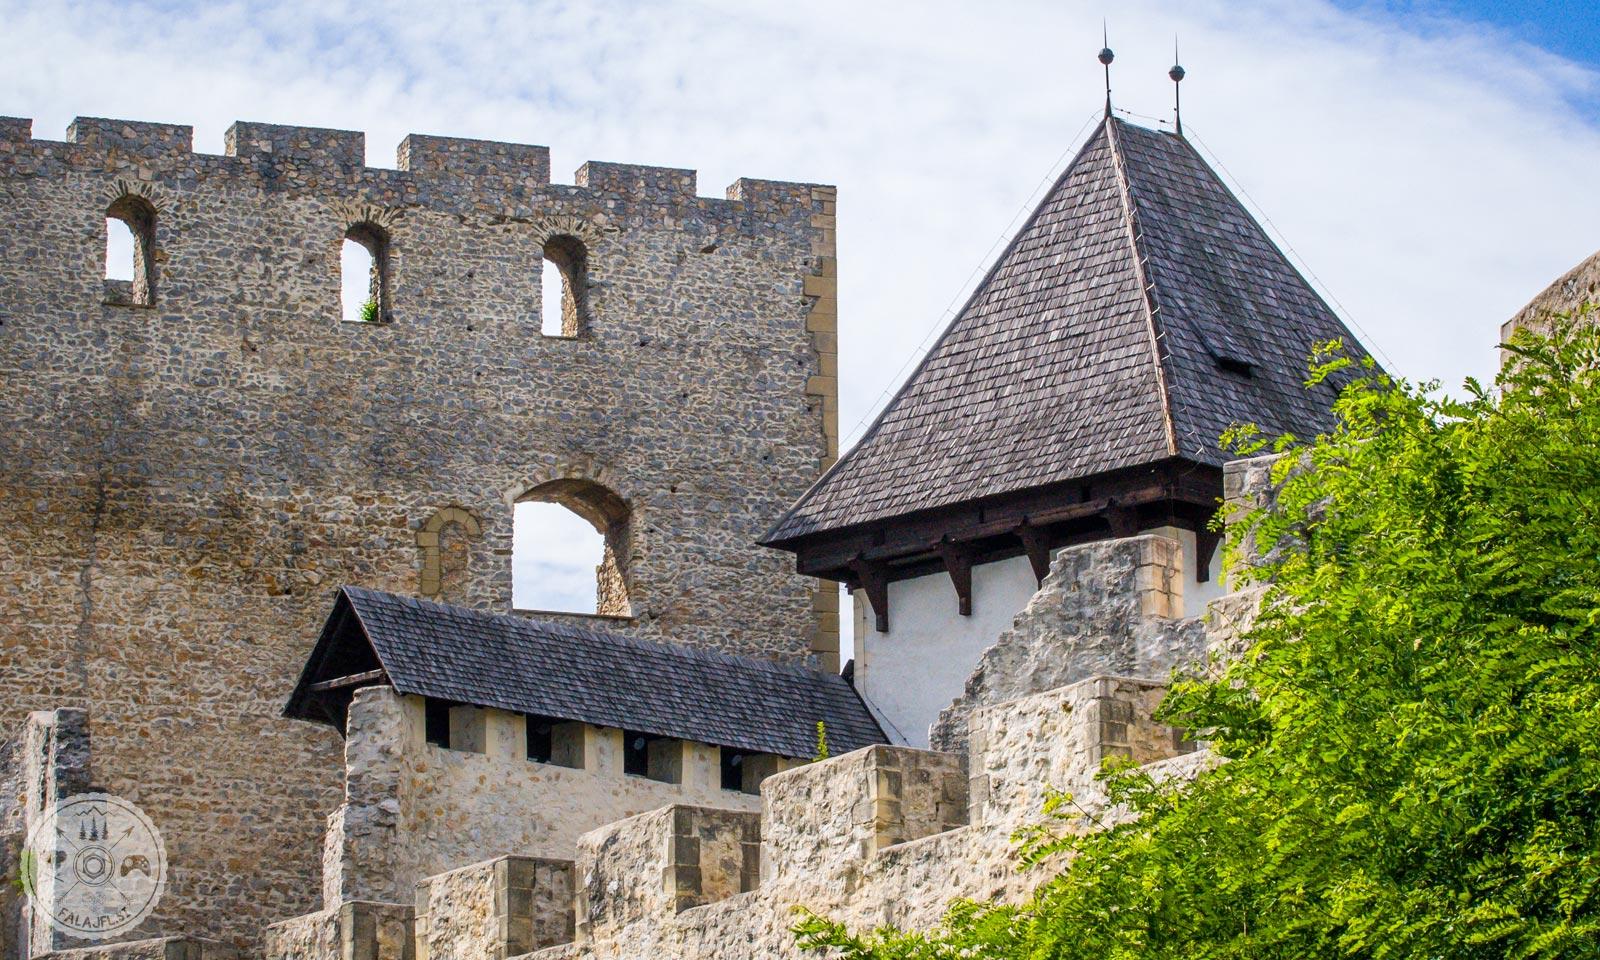 Stari grad Celje, celjski grad, celjski grofje, celje, Friderik I. Celjski, friderikov stolp